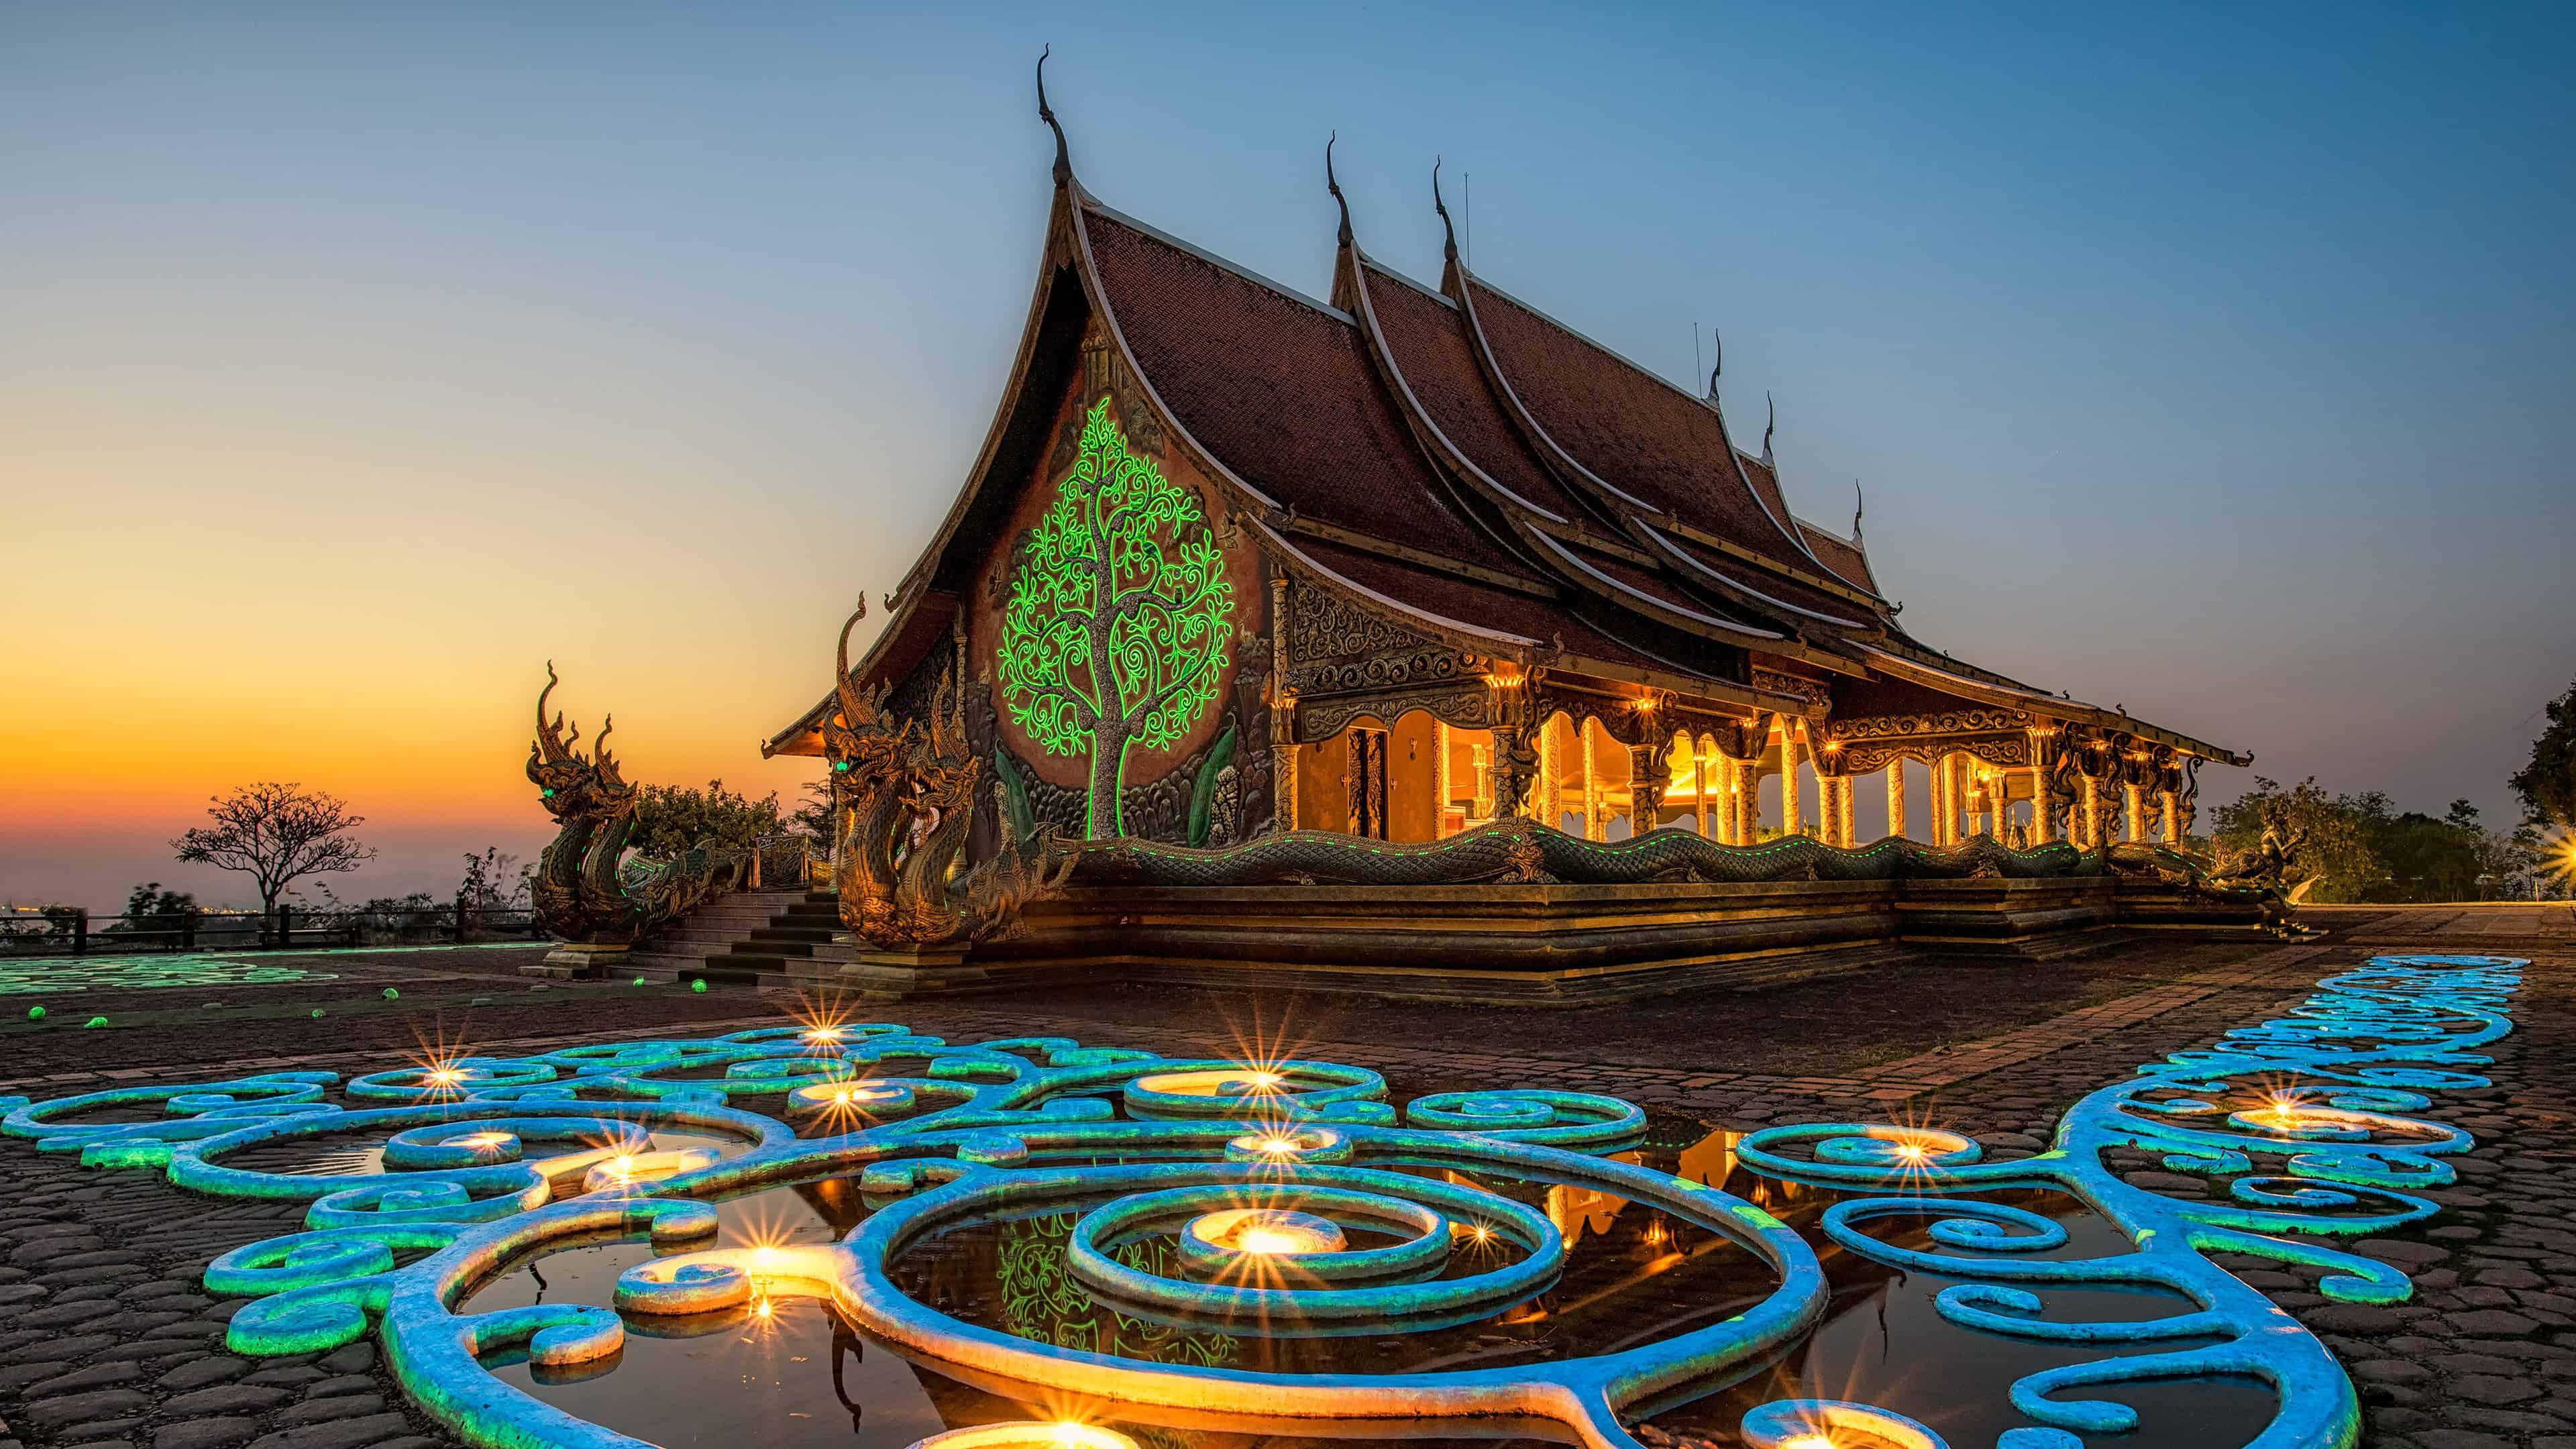 wat sirindhorn wararam phu prao buddhist temple ubon ratchatani thailand uhd 4k wallpaper